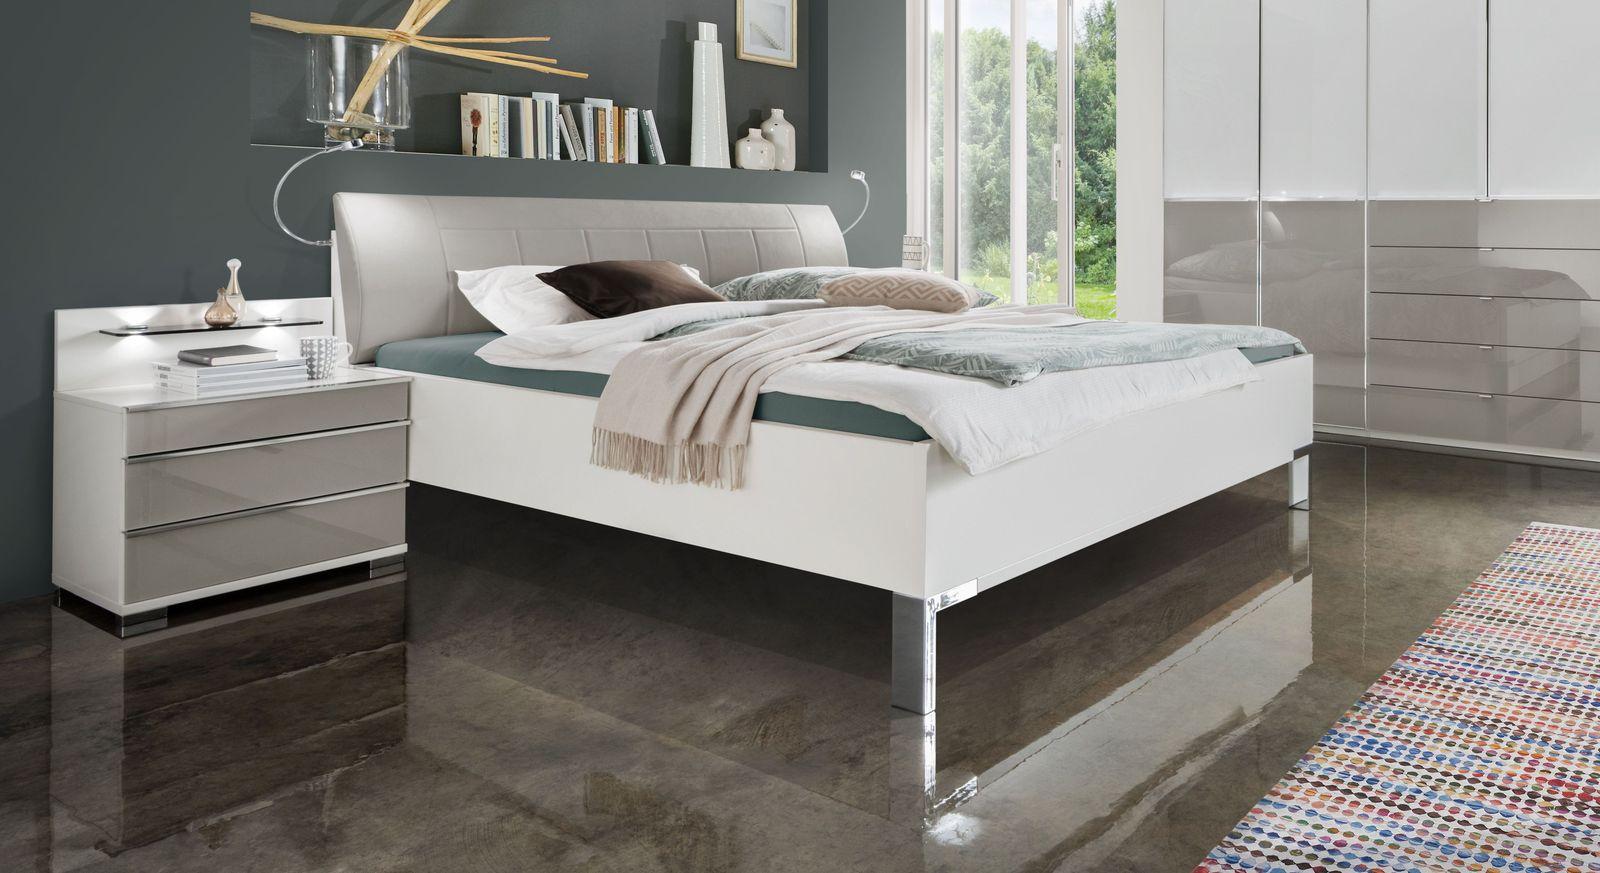 Bett Shanvalley mit eleganten Metallfüßen